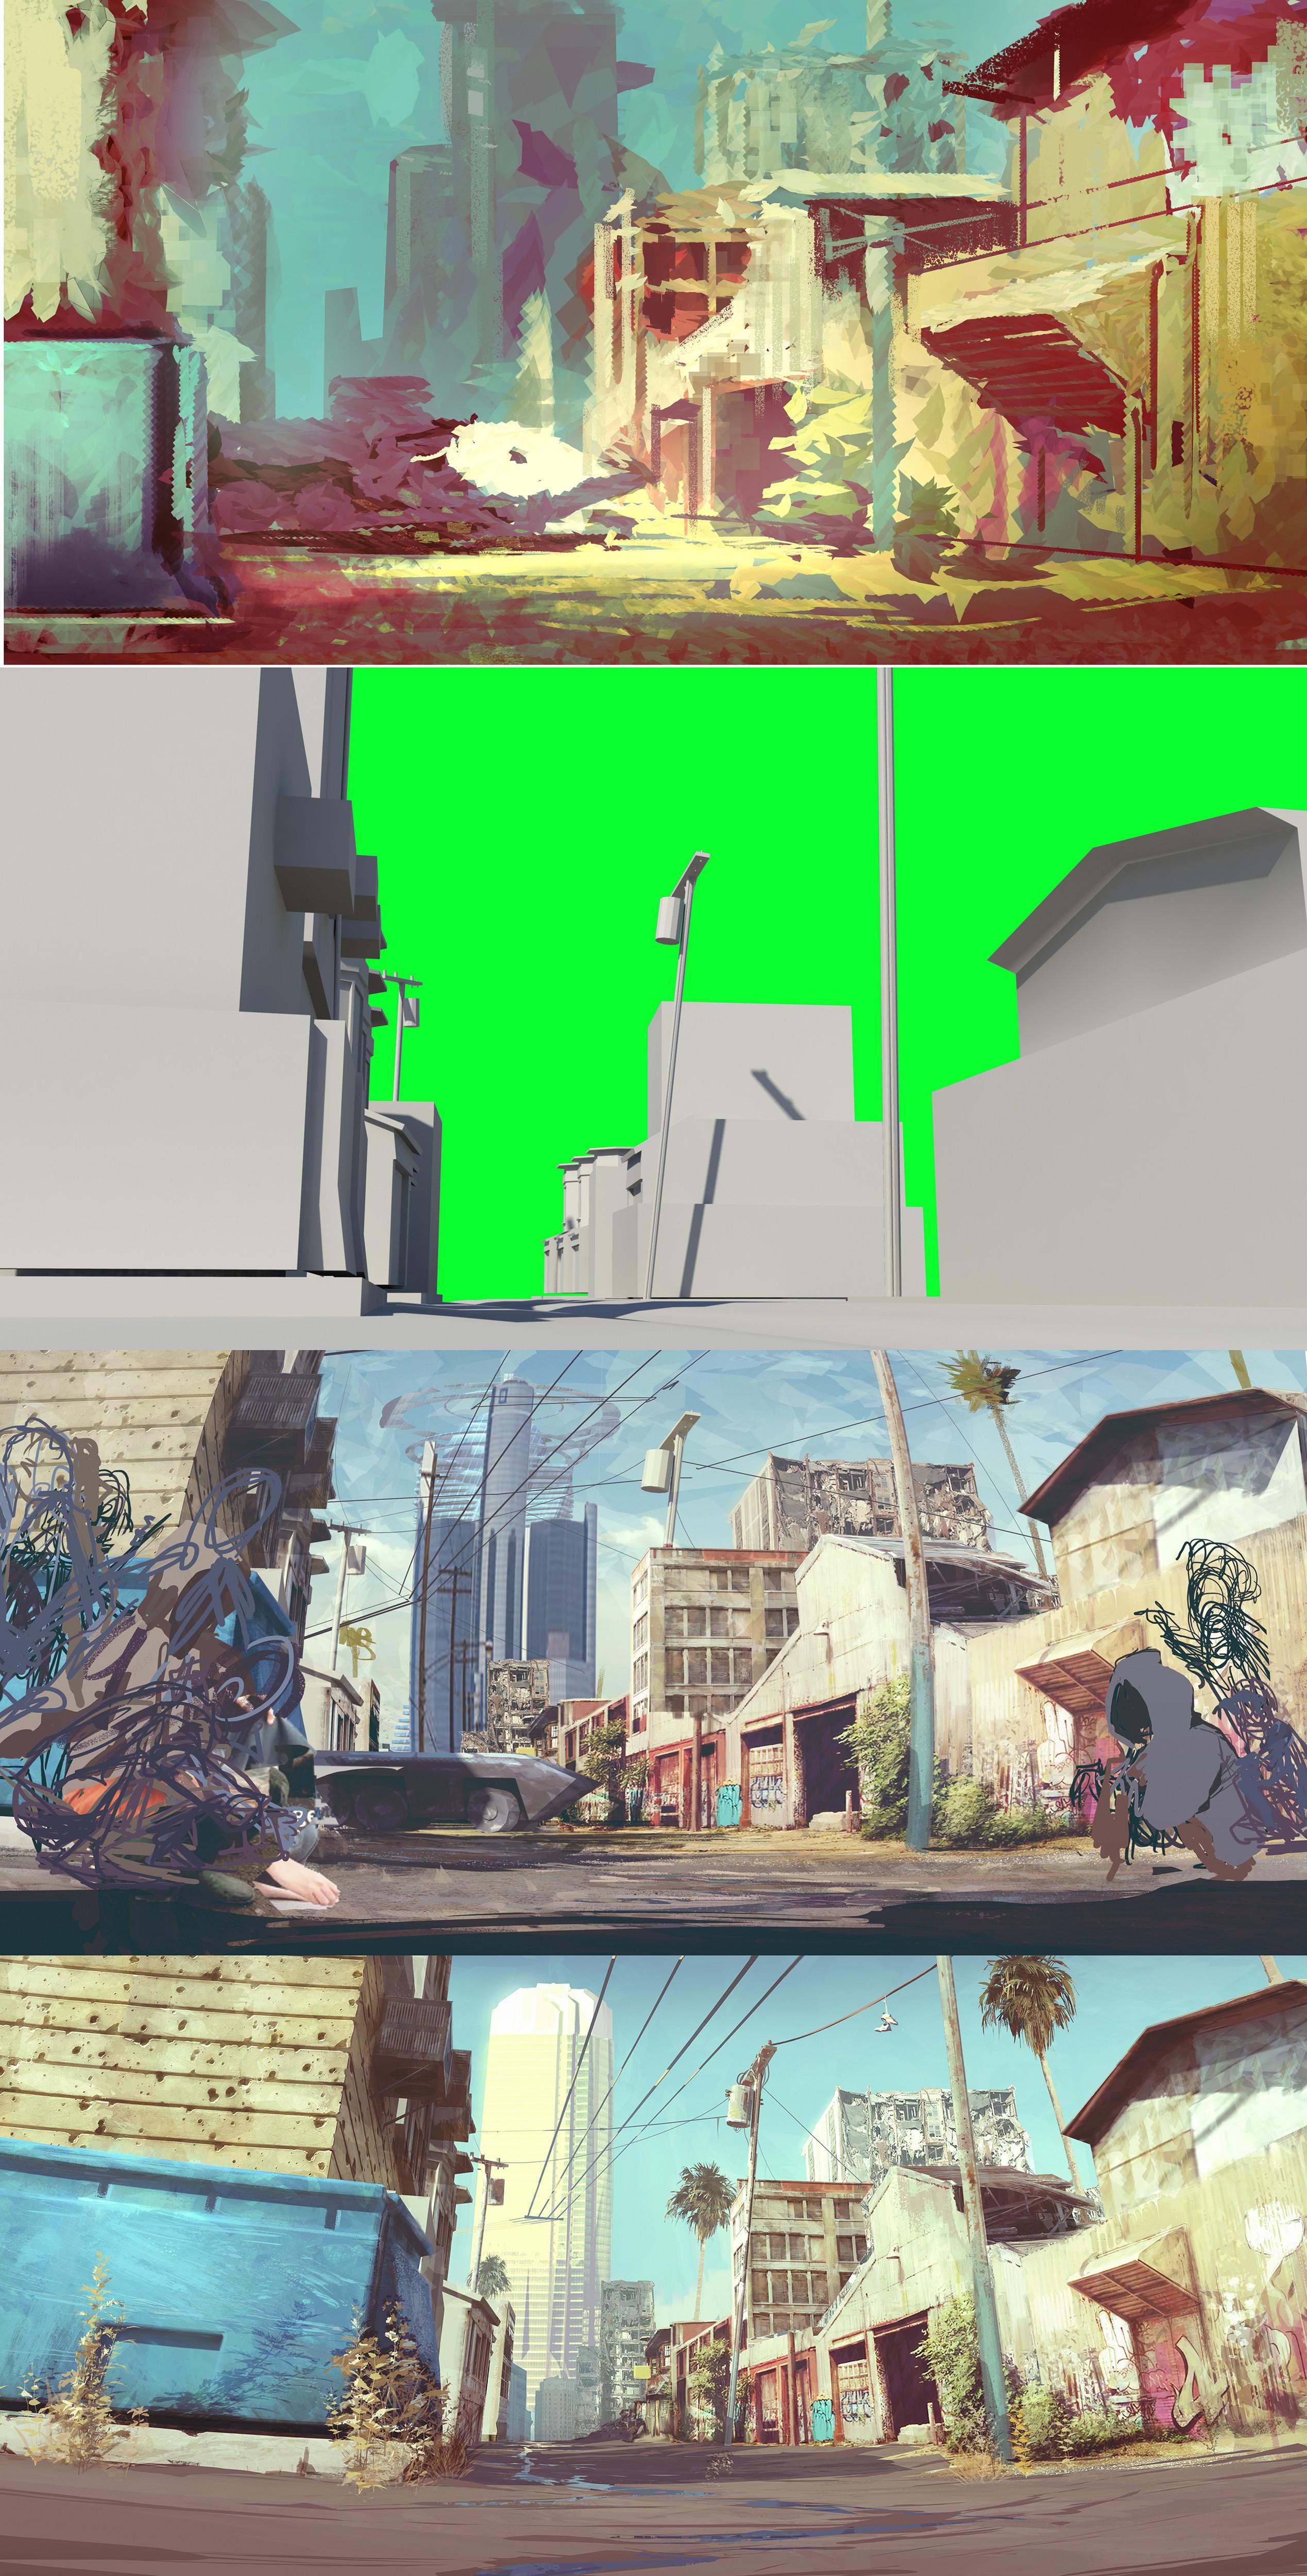 background progression